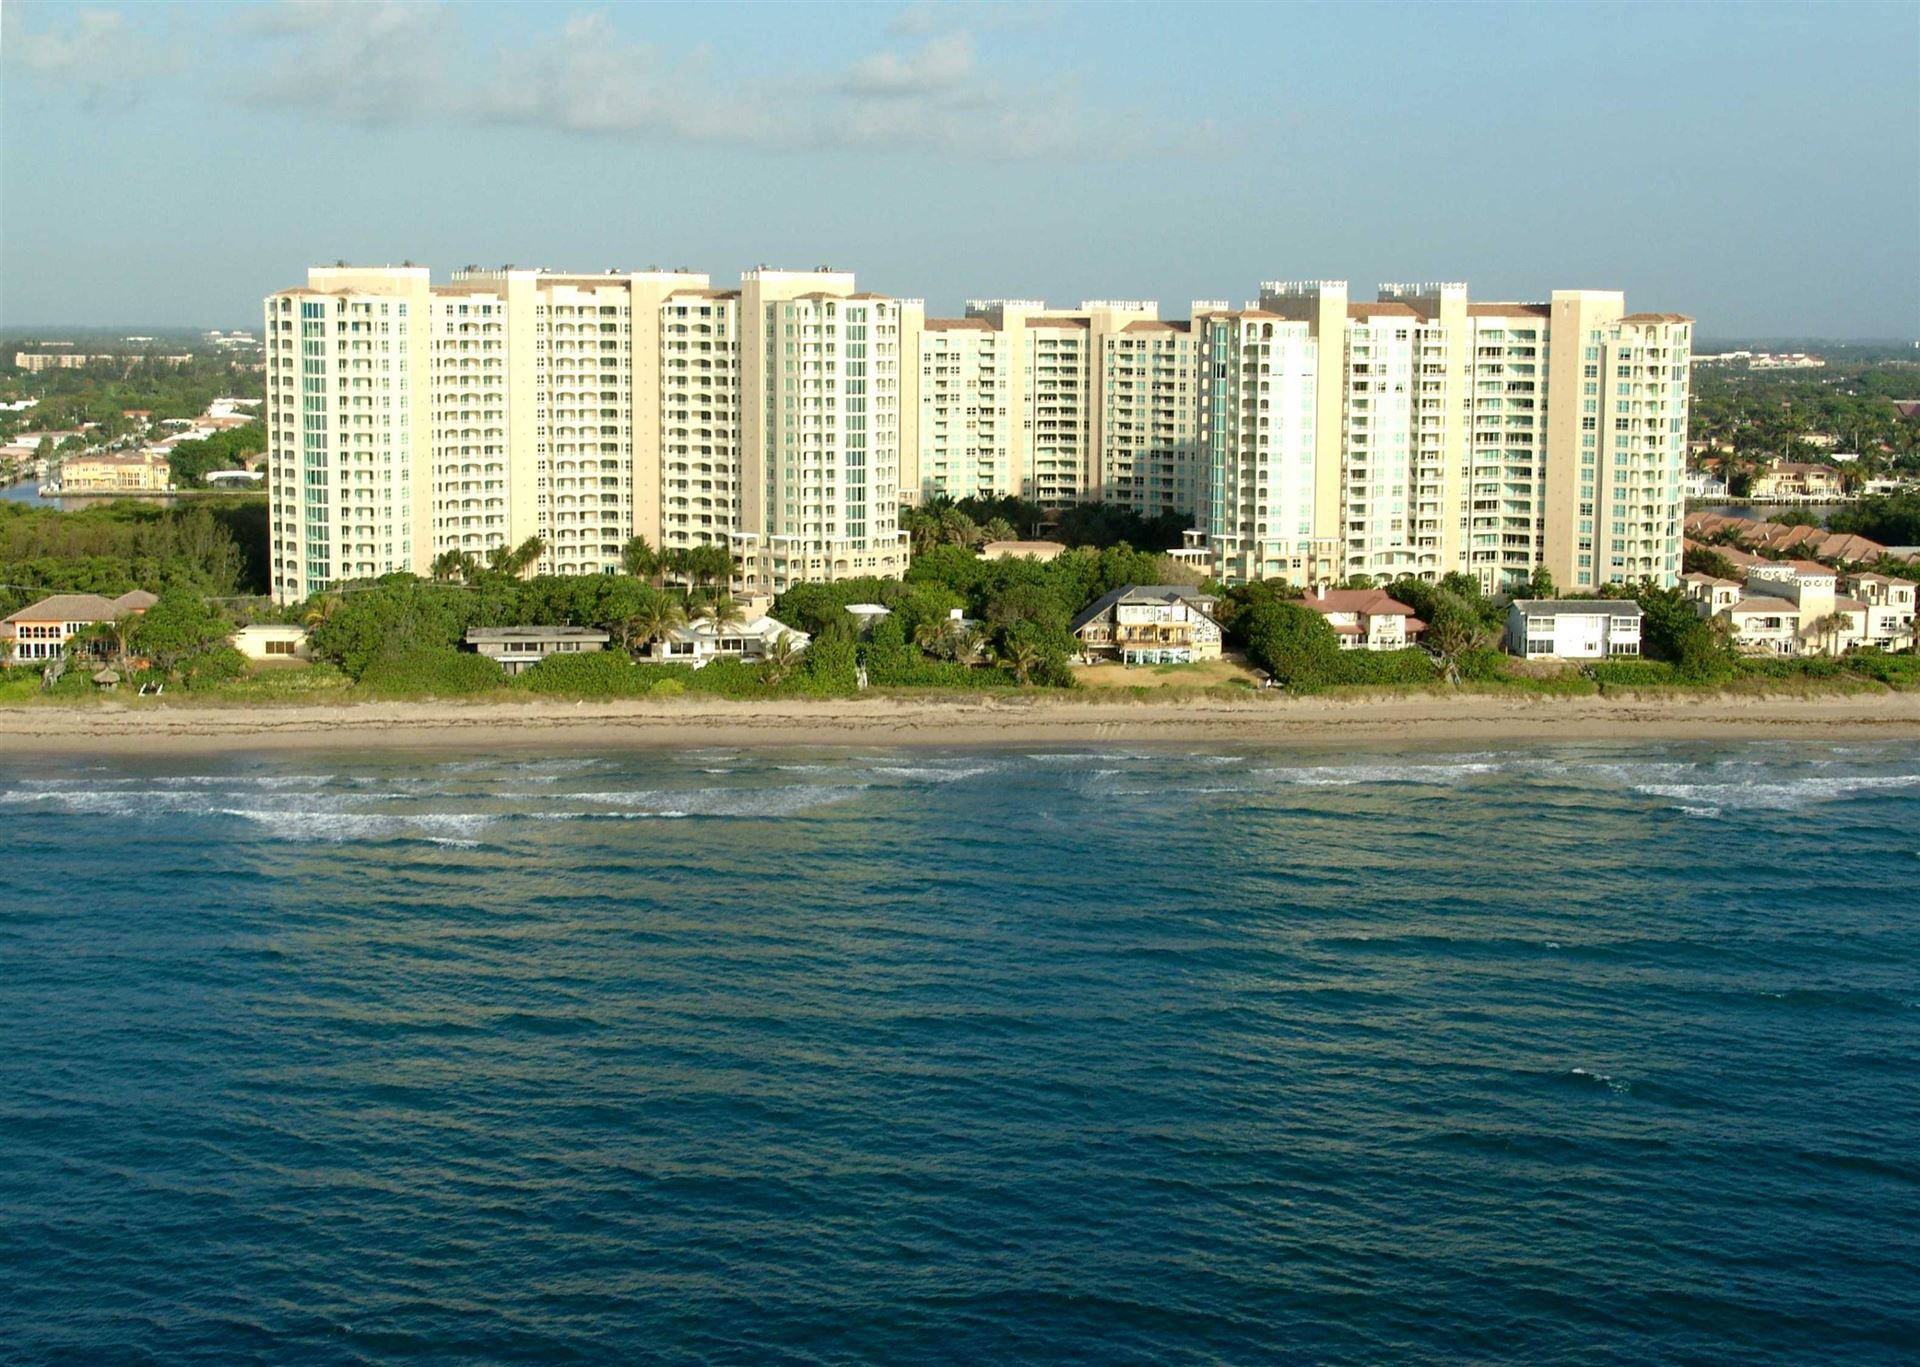 3720 S Ocean Boulevard #208, Highland Beach, FL 33487 - #: RX-10579057